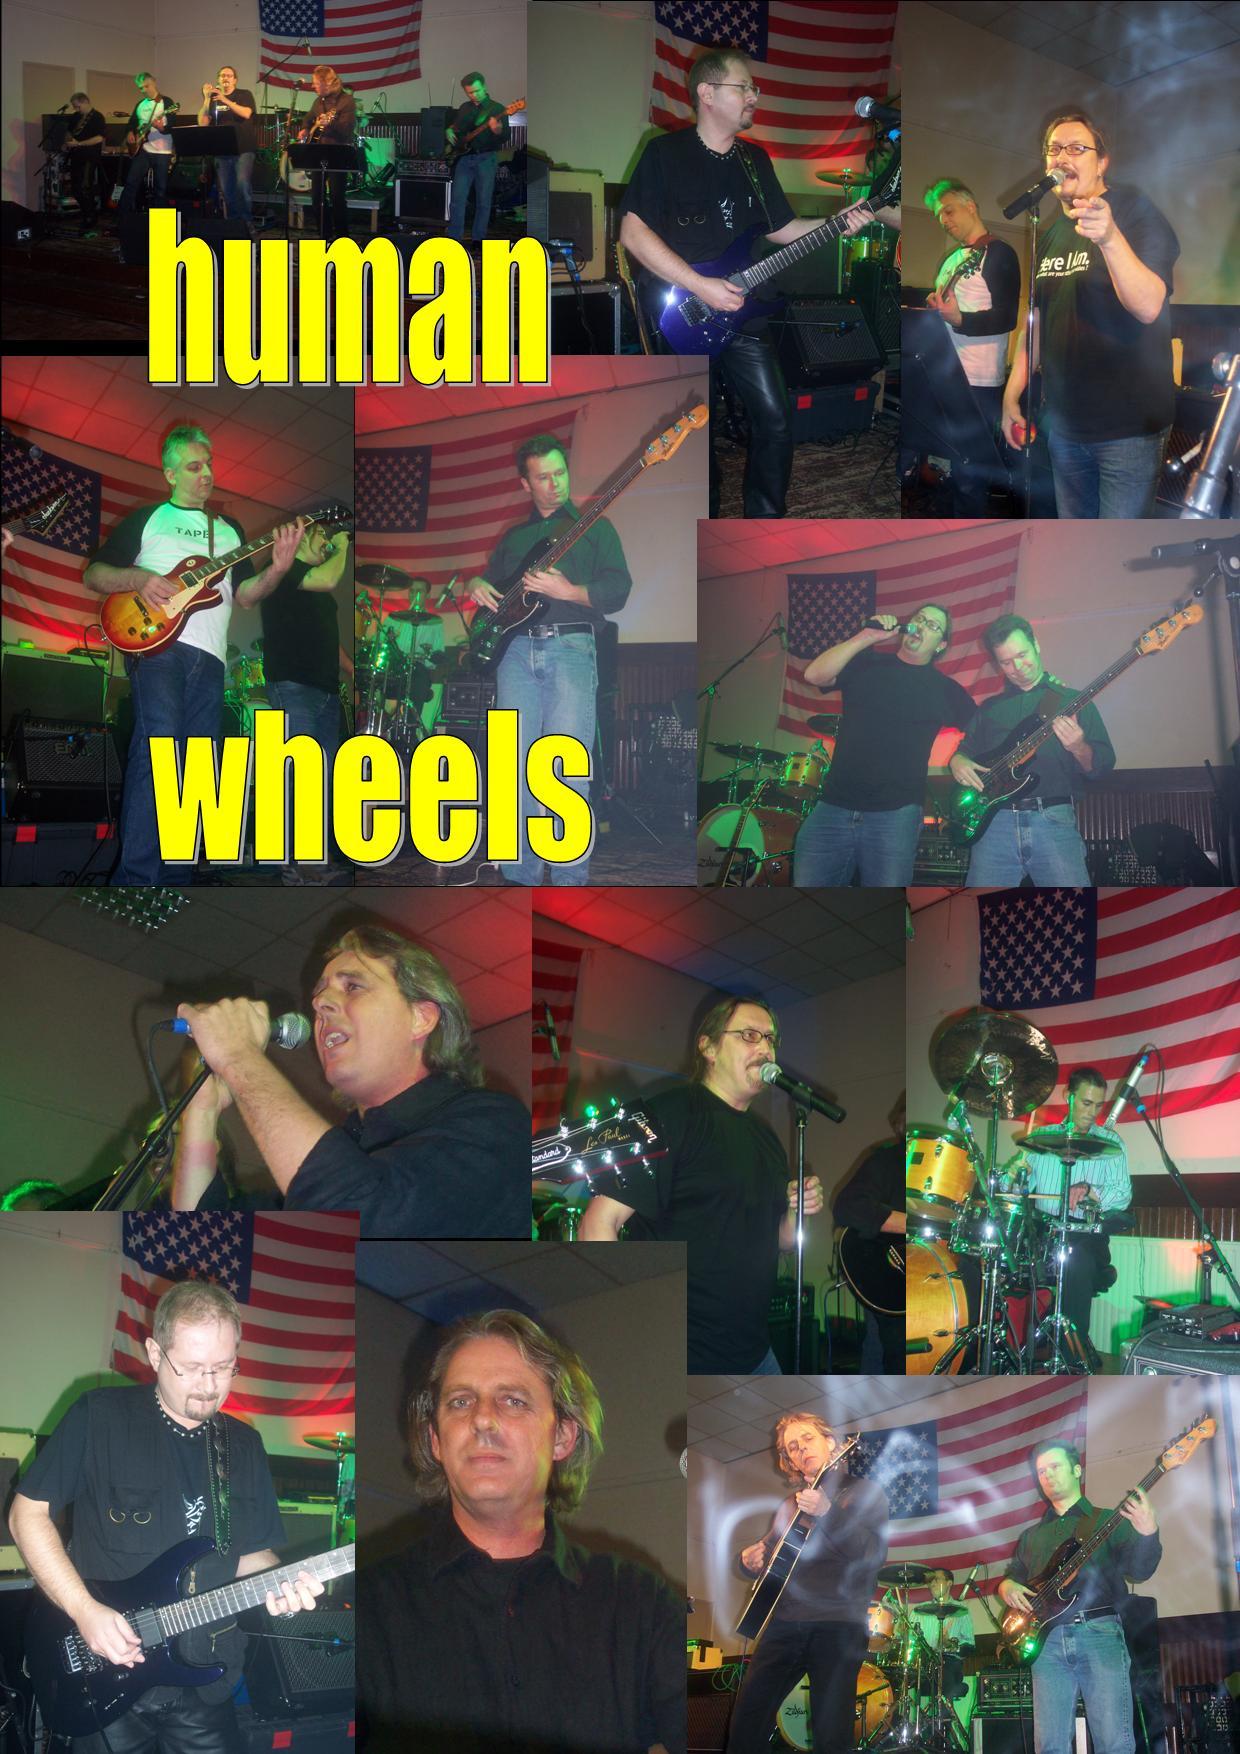 human wheels.jpg